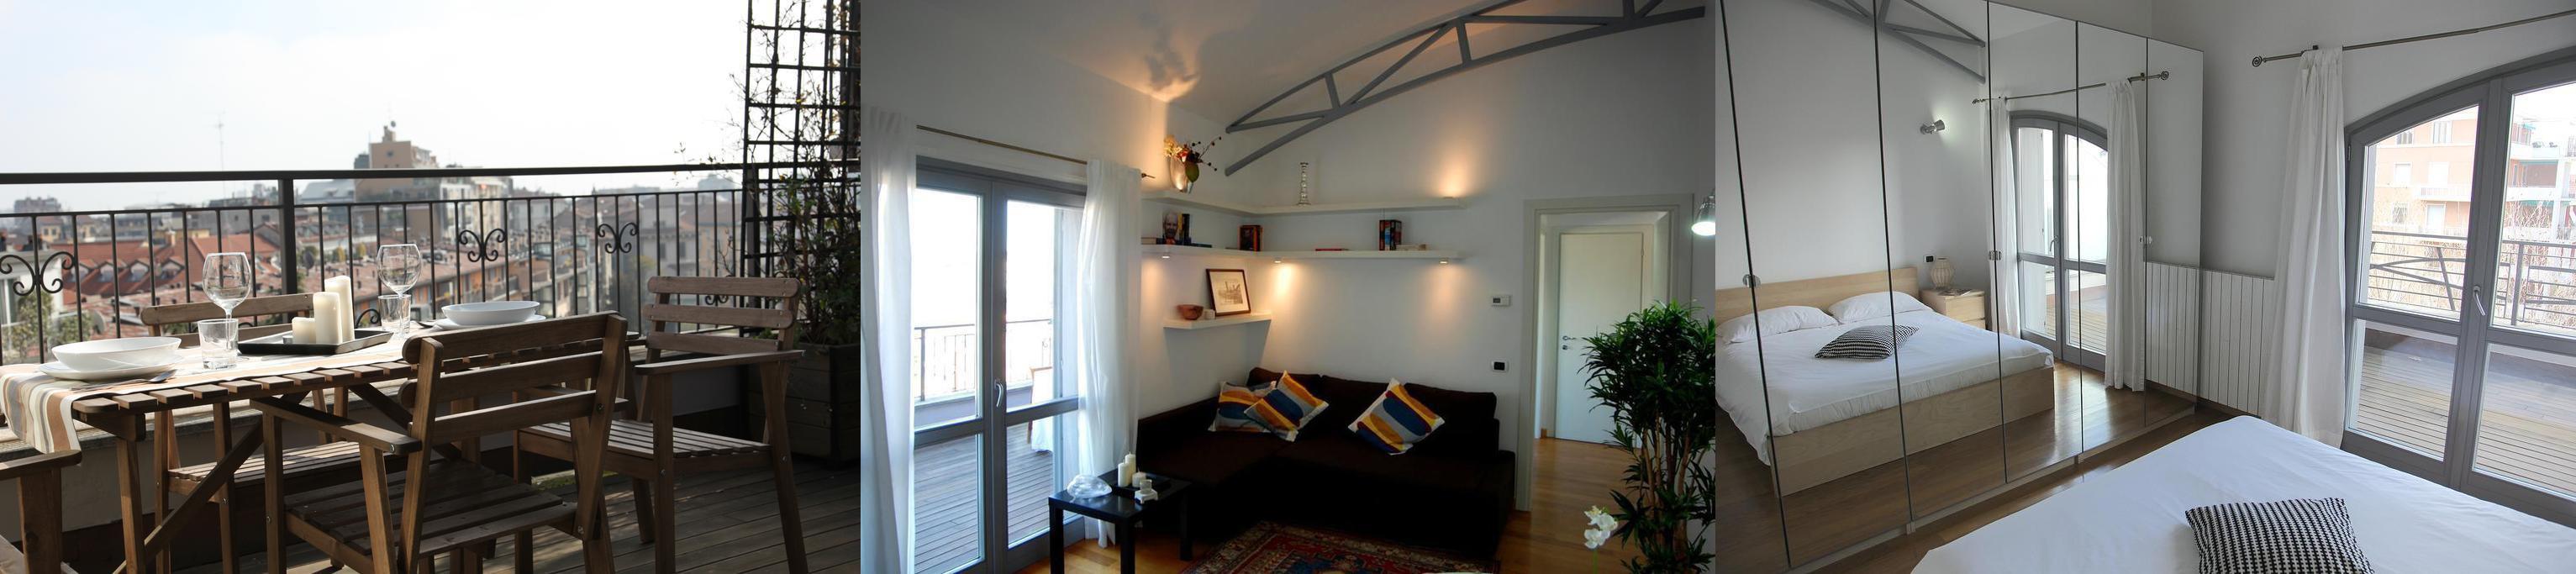 appartamento-cimarosa-pagano